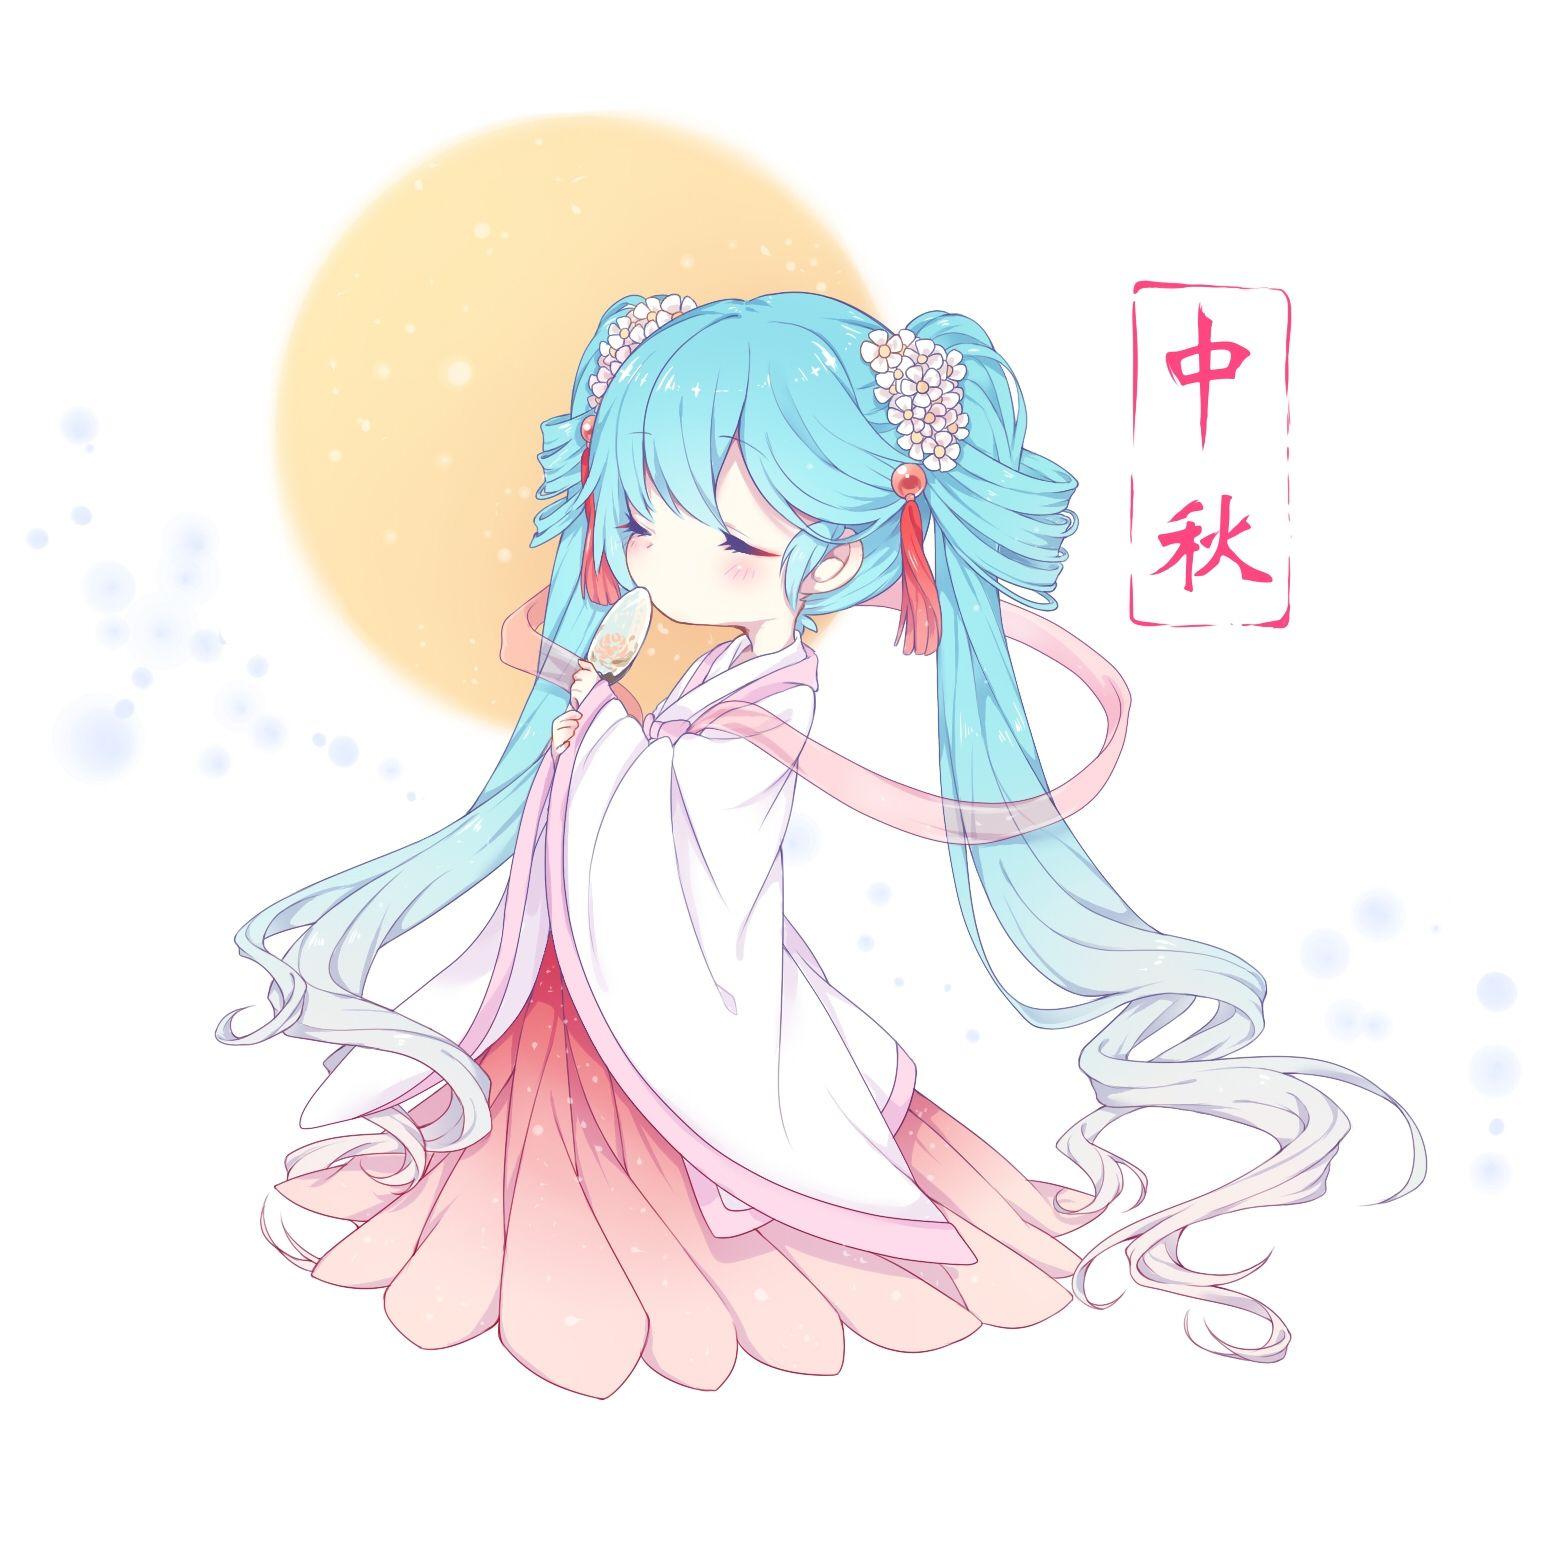 Pin by xonthei rose on miku hatsune miku anime art - Cute anime miku ...